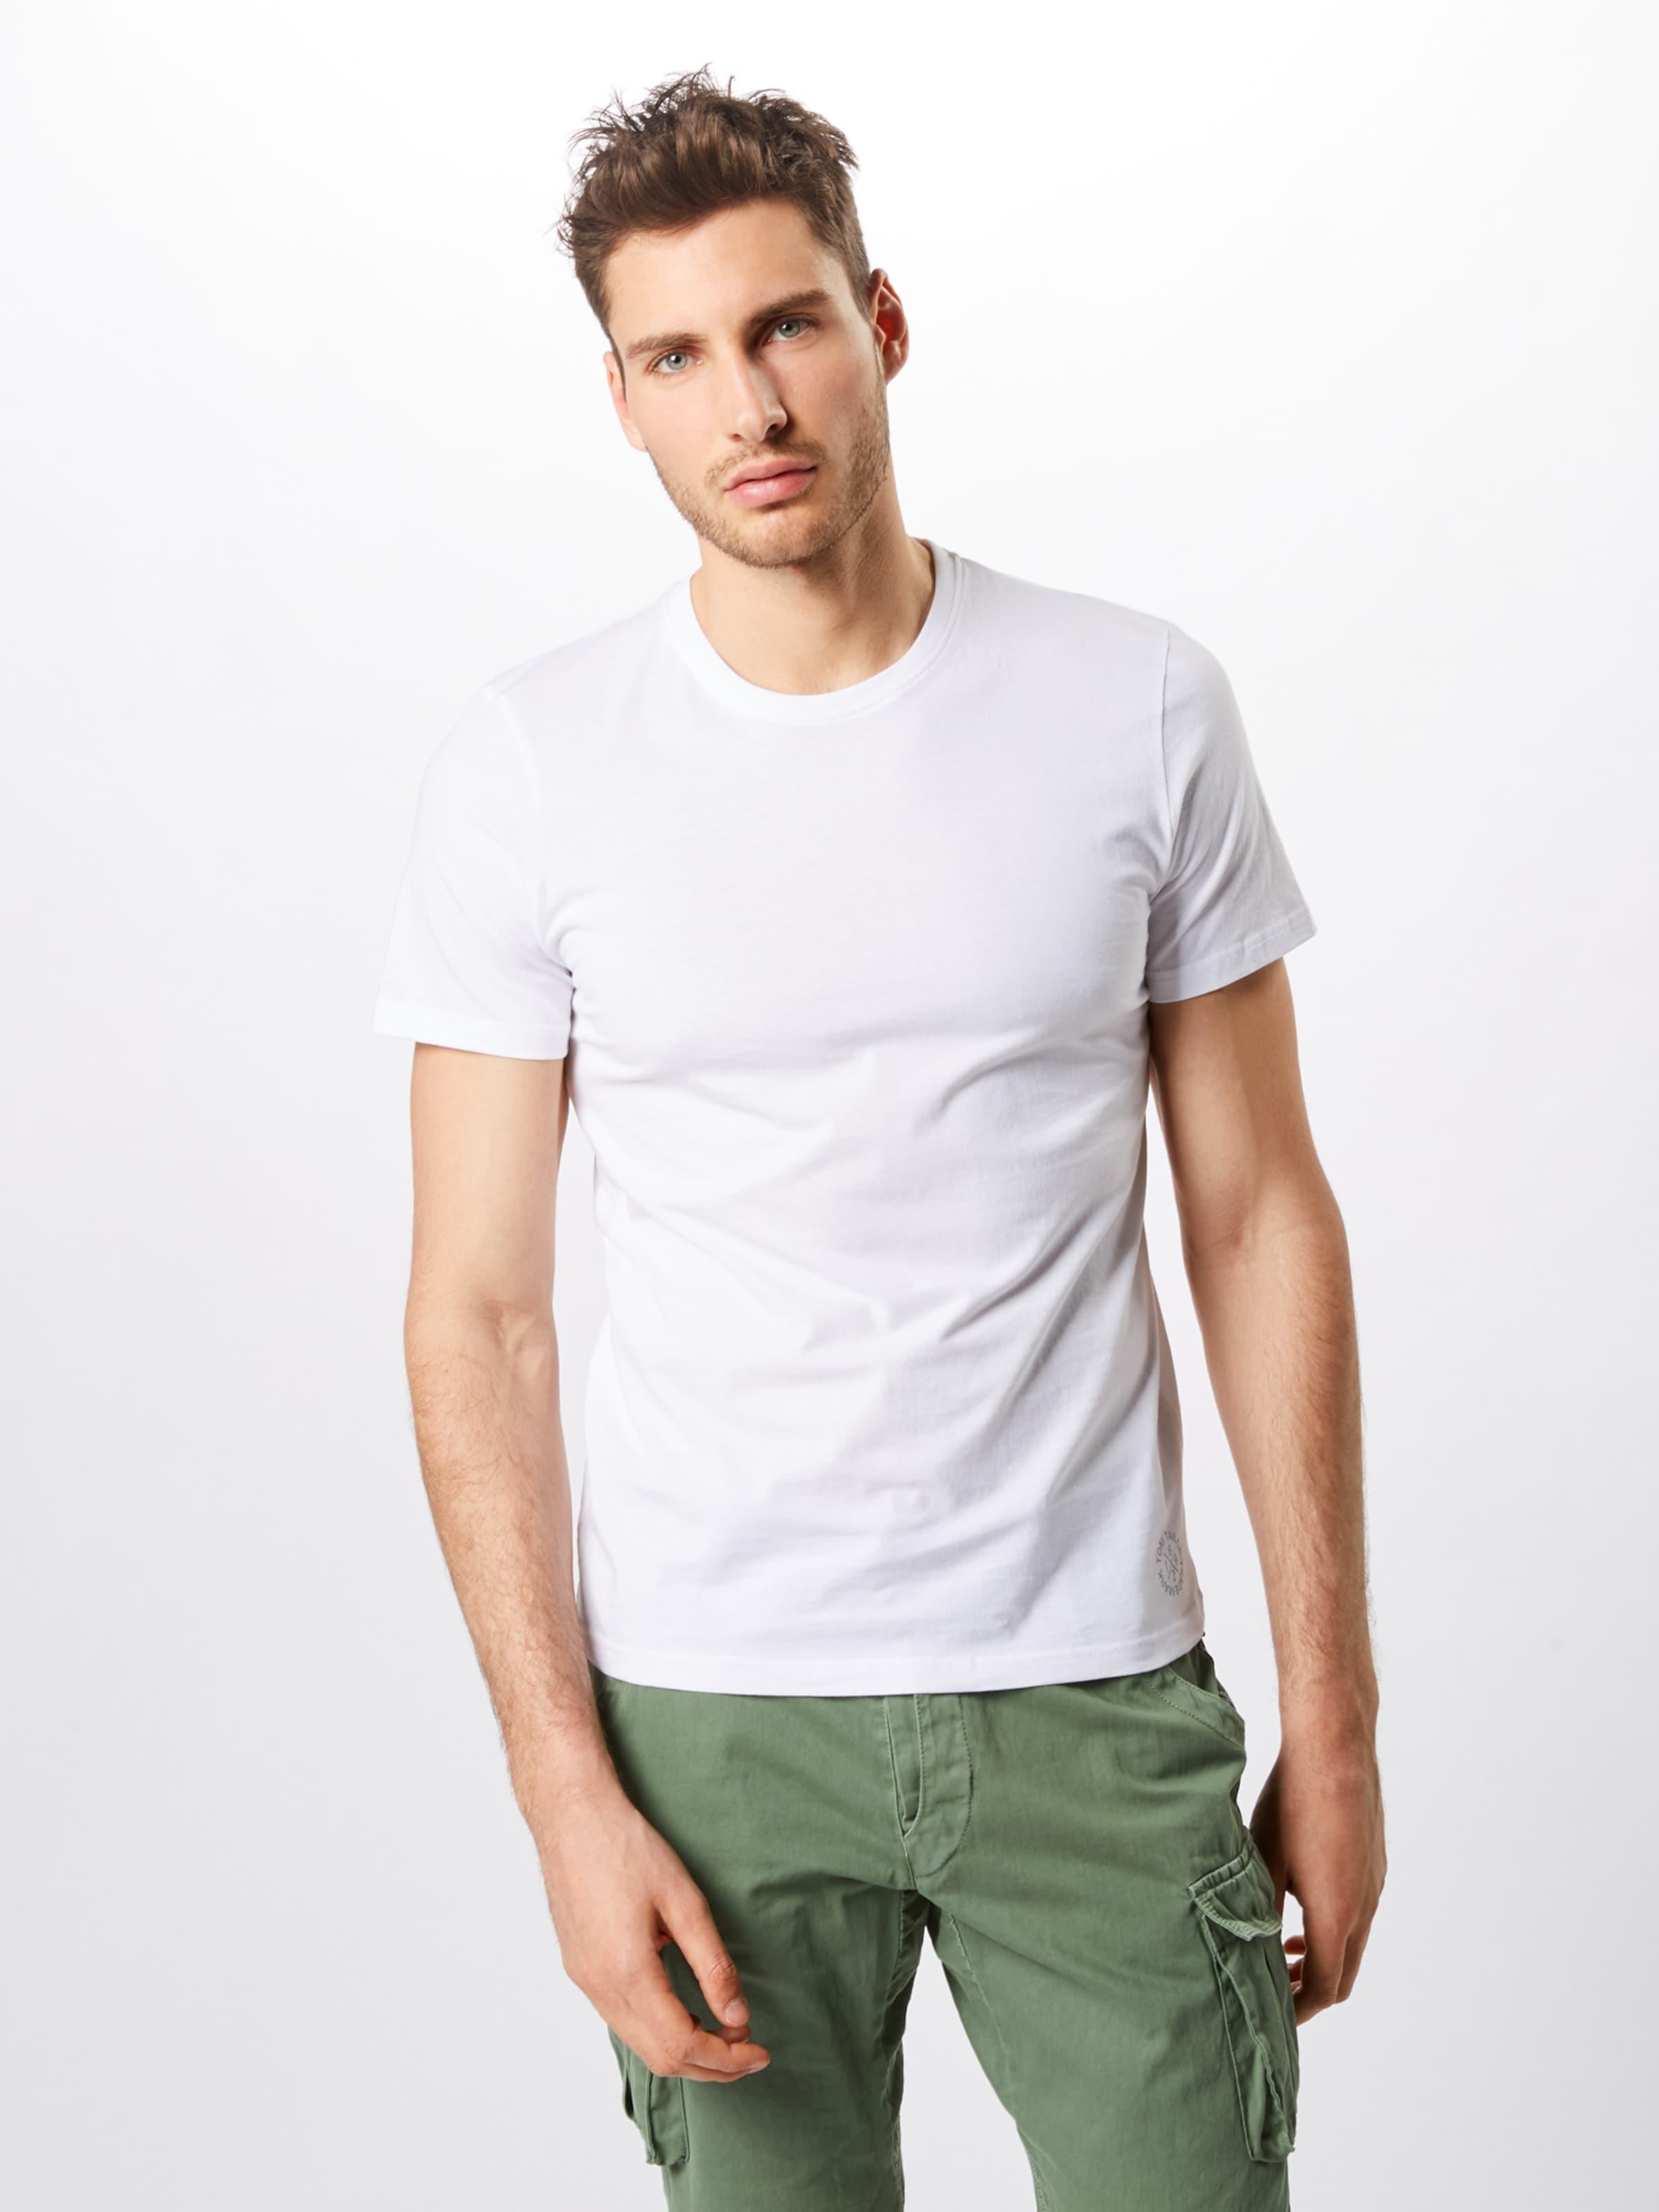 'double Crew Tailor shirt Shirt Pack 1 Weiß 2' Tee Tom In Neck T XiPukZ